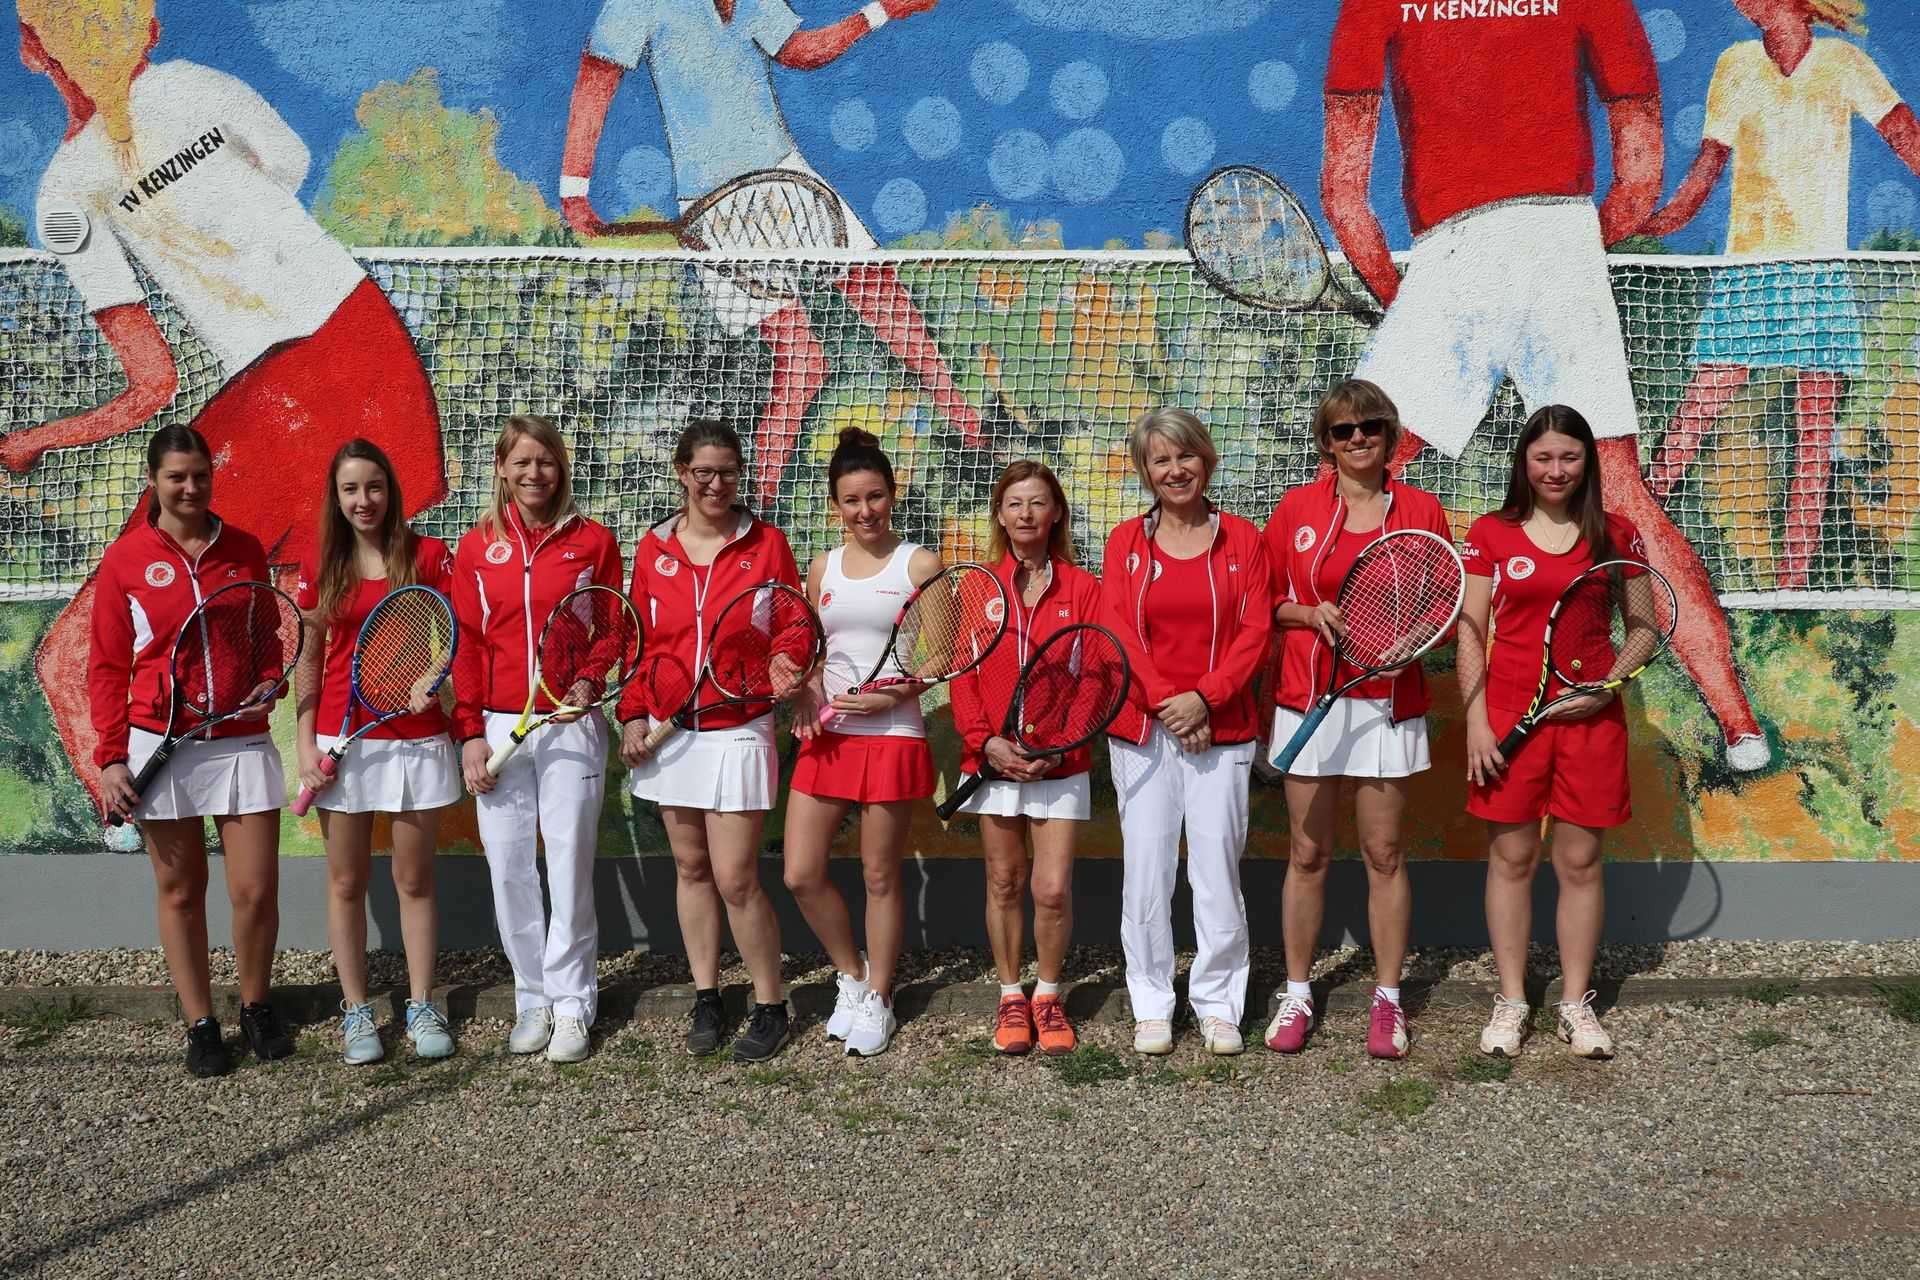 Tennisverein Kenzingen manschafte 2